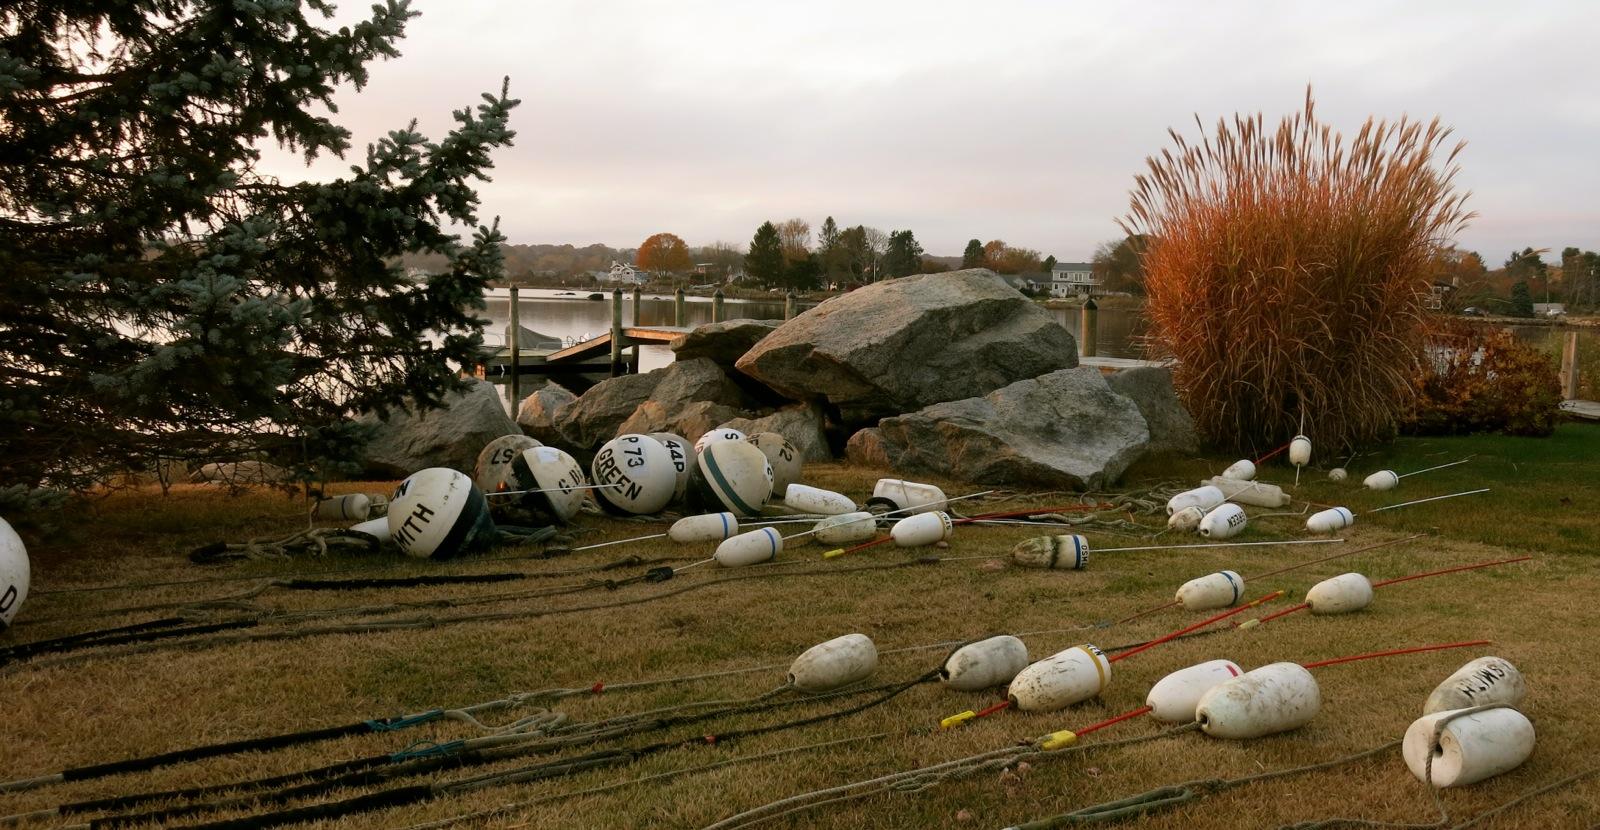 Lobster Trap Buoys on land off season in Stonington CT